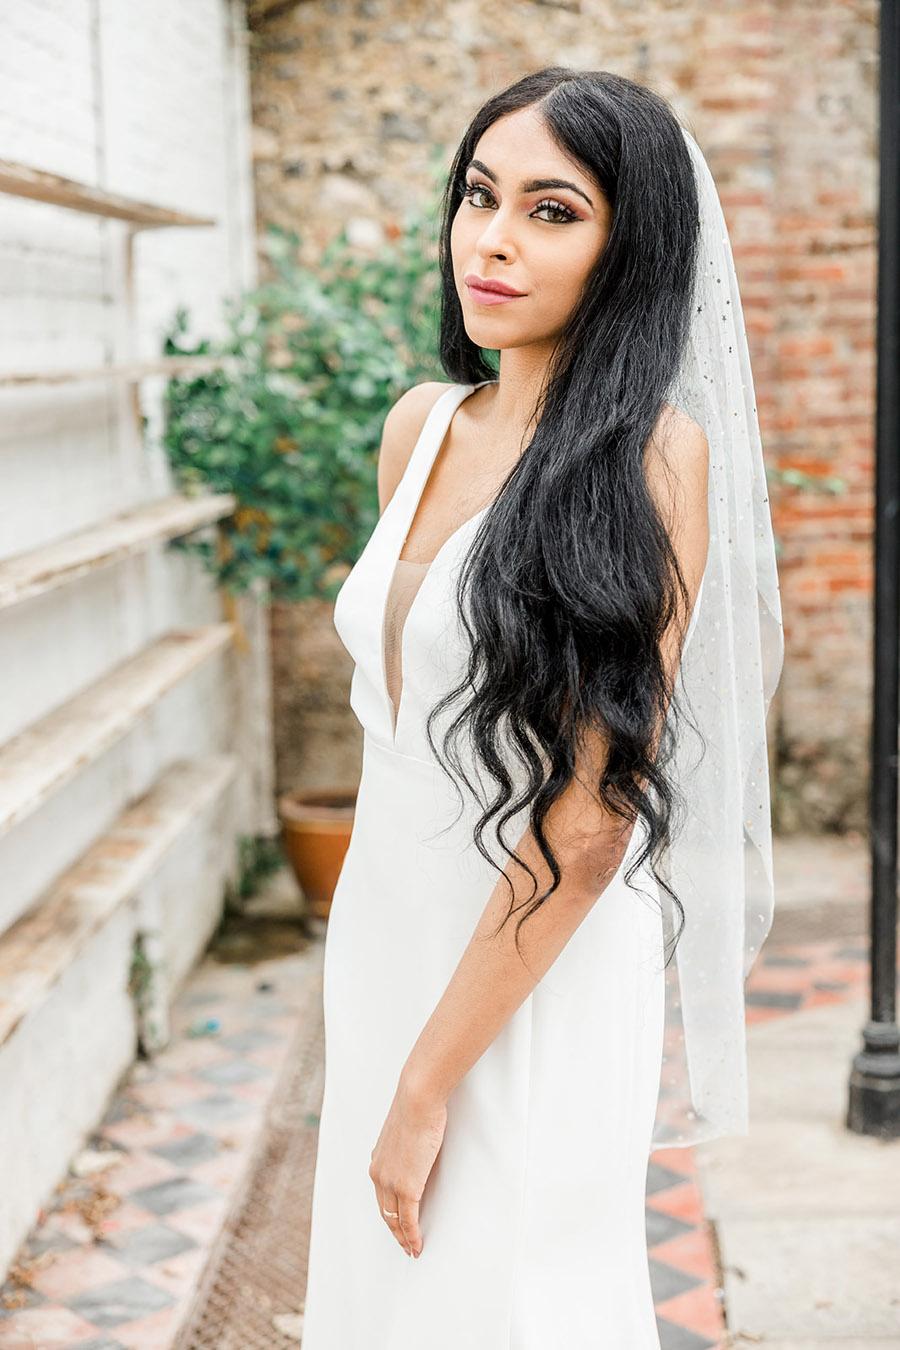 Modern Boho wedding style inspiration from Slindon House, photographer credit Kelsie Scully Photography (34)